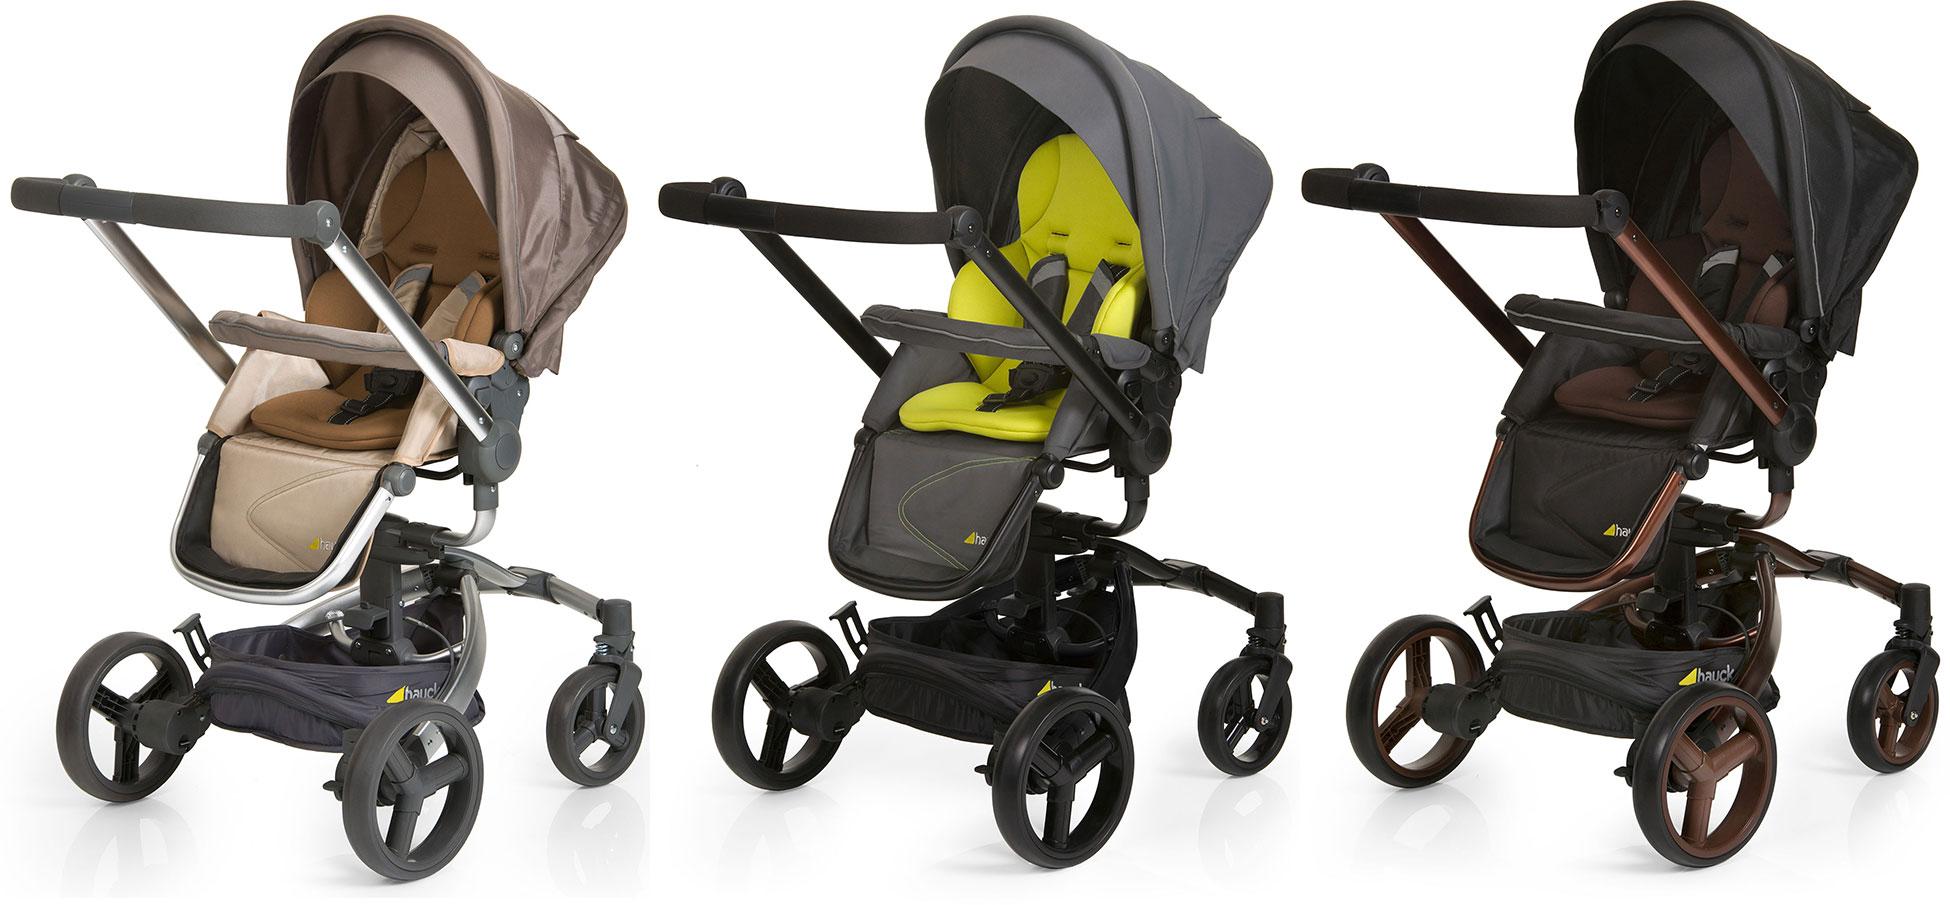 hauck twister trio set travel system car seat carry cot pram baby toddler bn. Black Bedroom Furniture Sets. Home Design Ideas